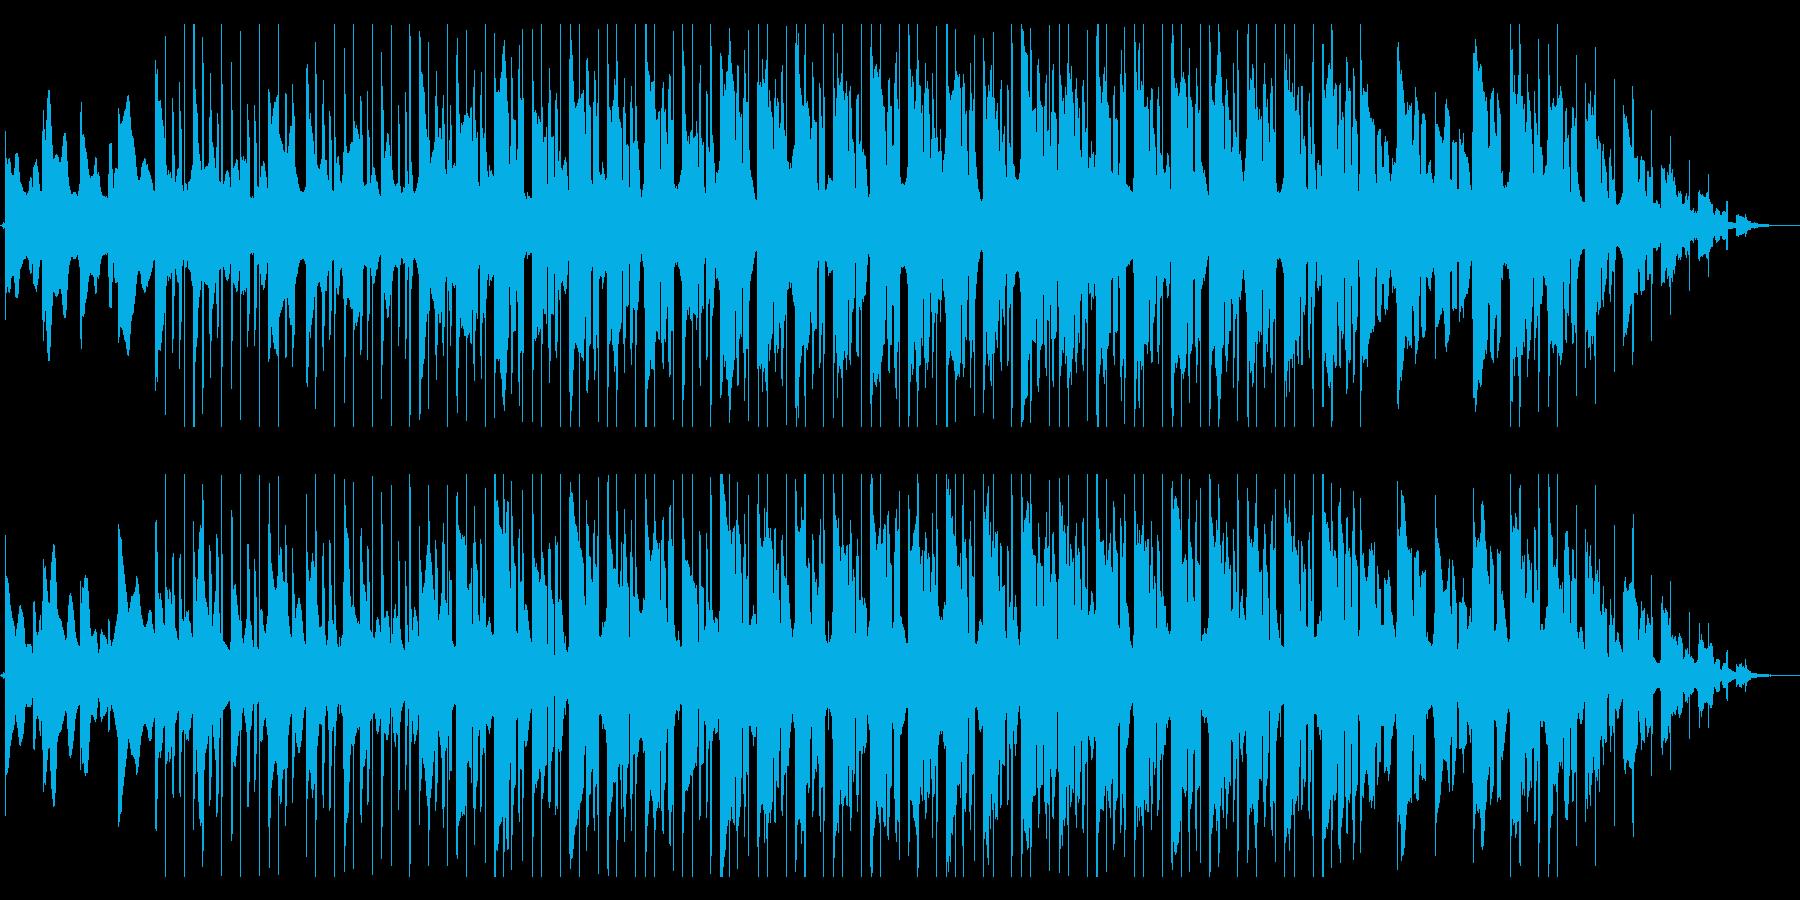 Lofi Hip Hop 02の再生済みの波形